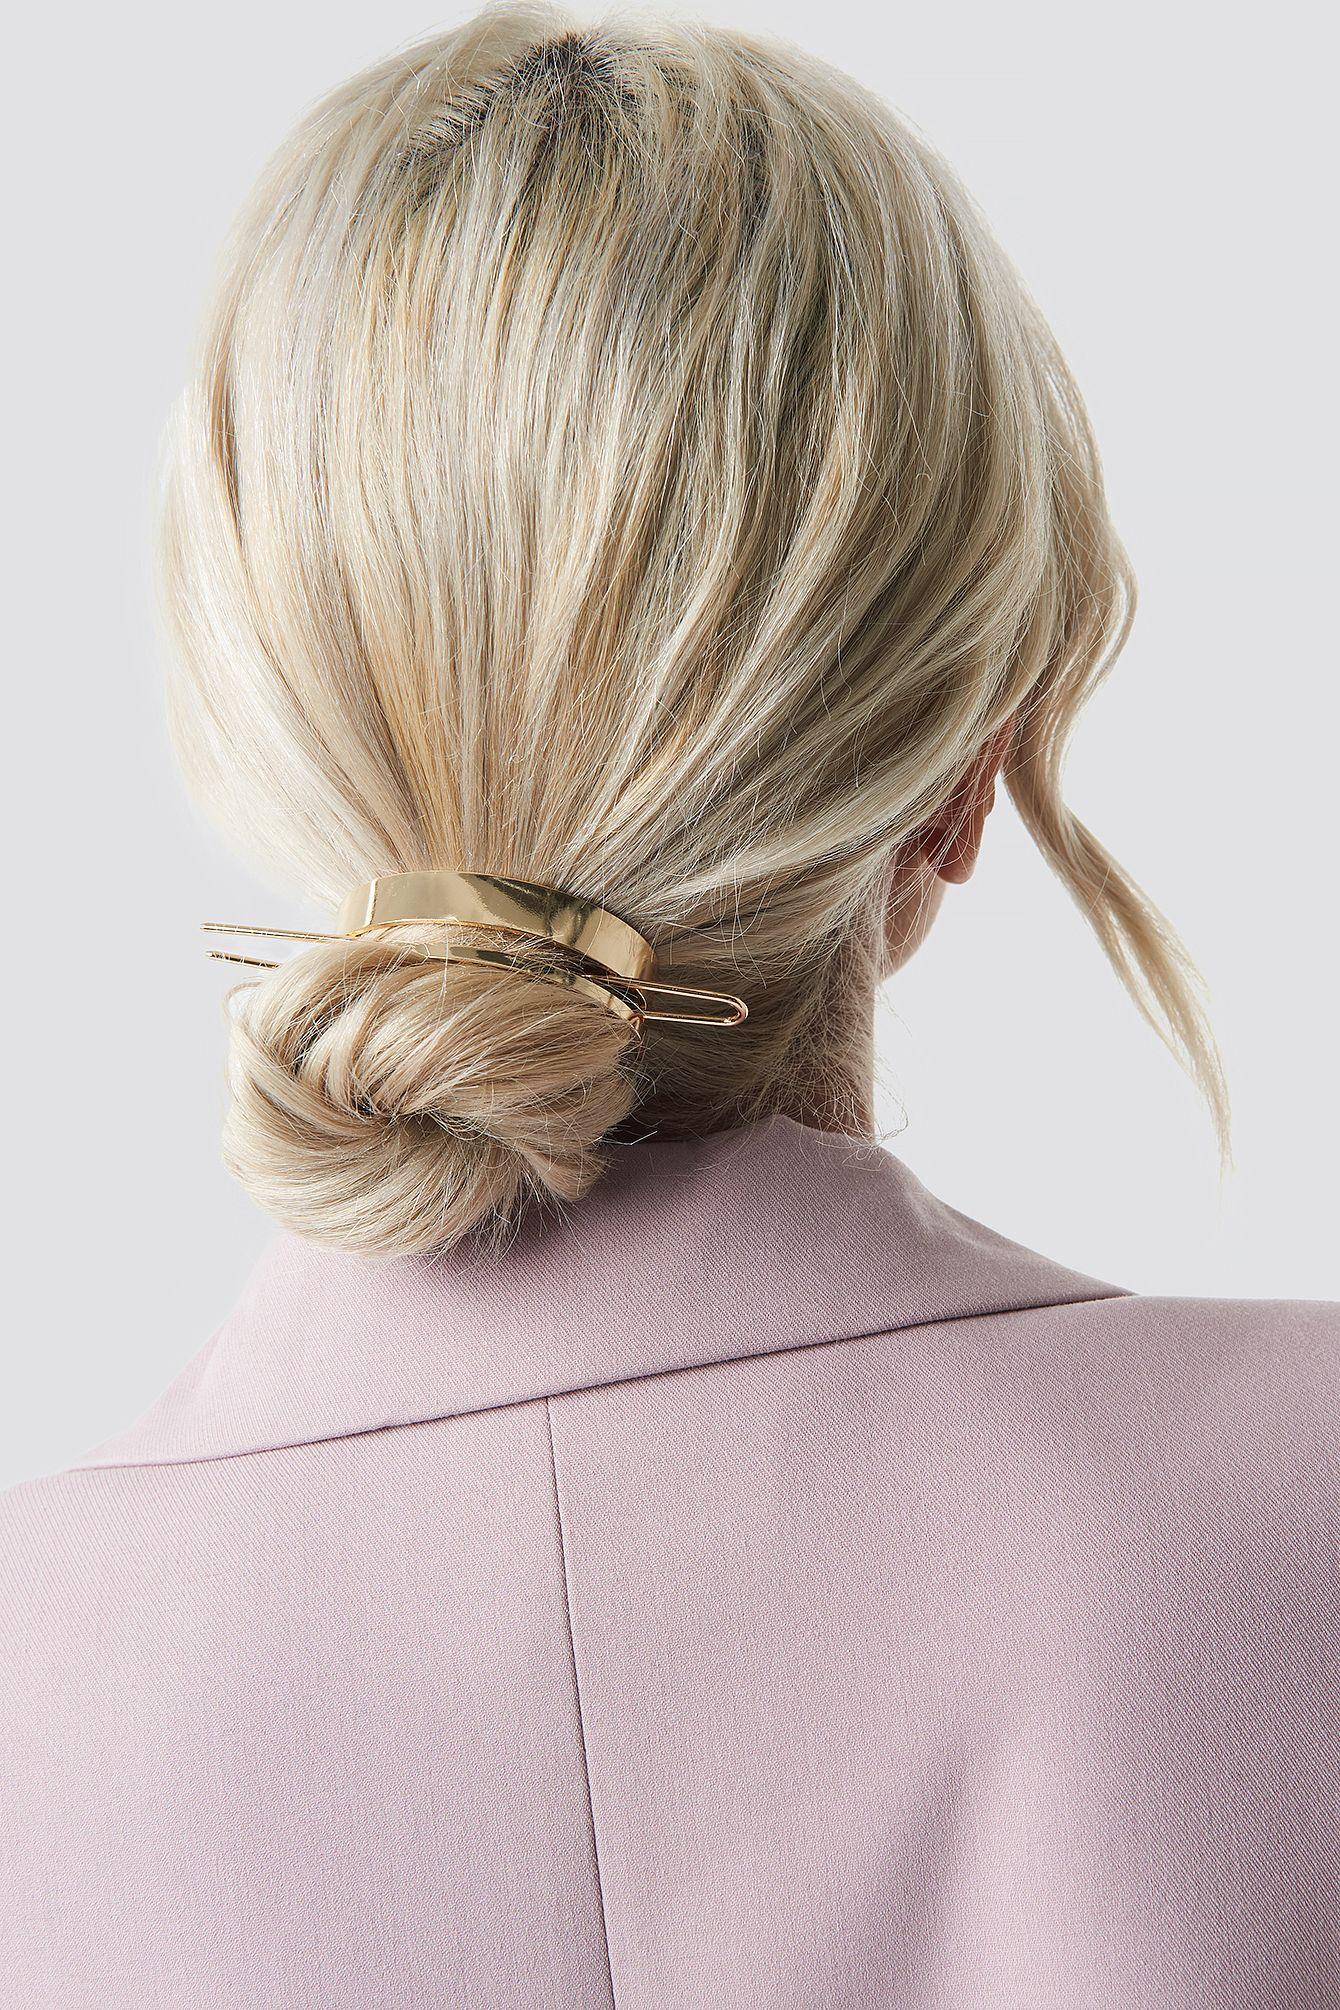 Circle Hair Pin In 2020 Frisuren Kurz Haarnadeln Haar Styling